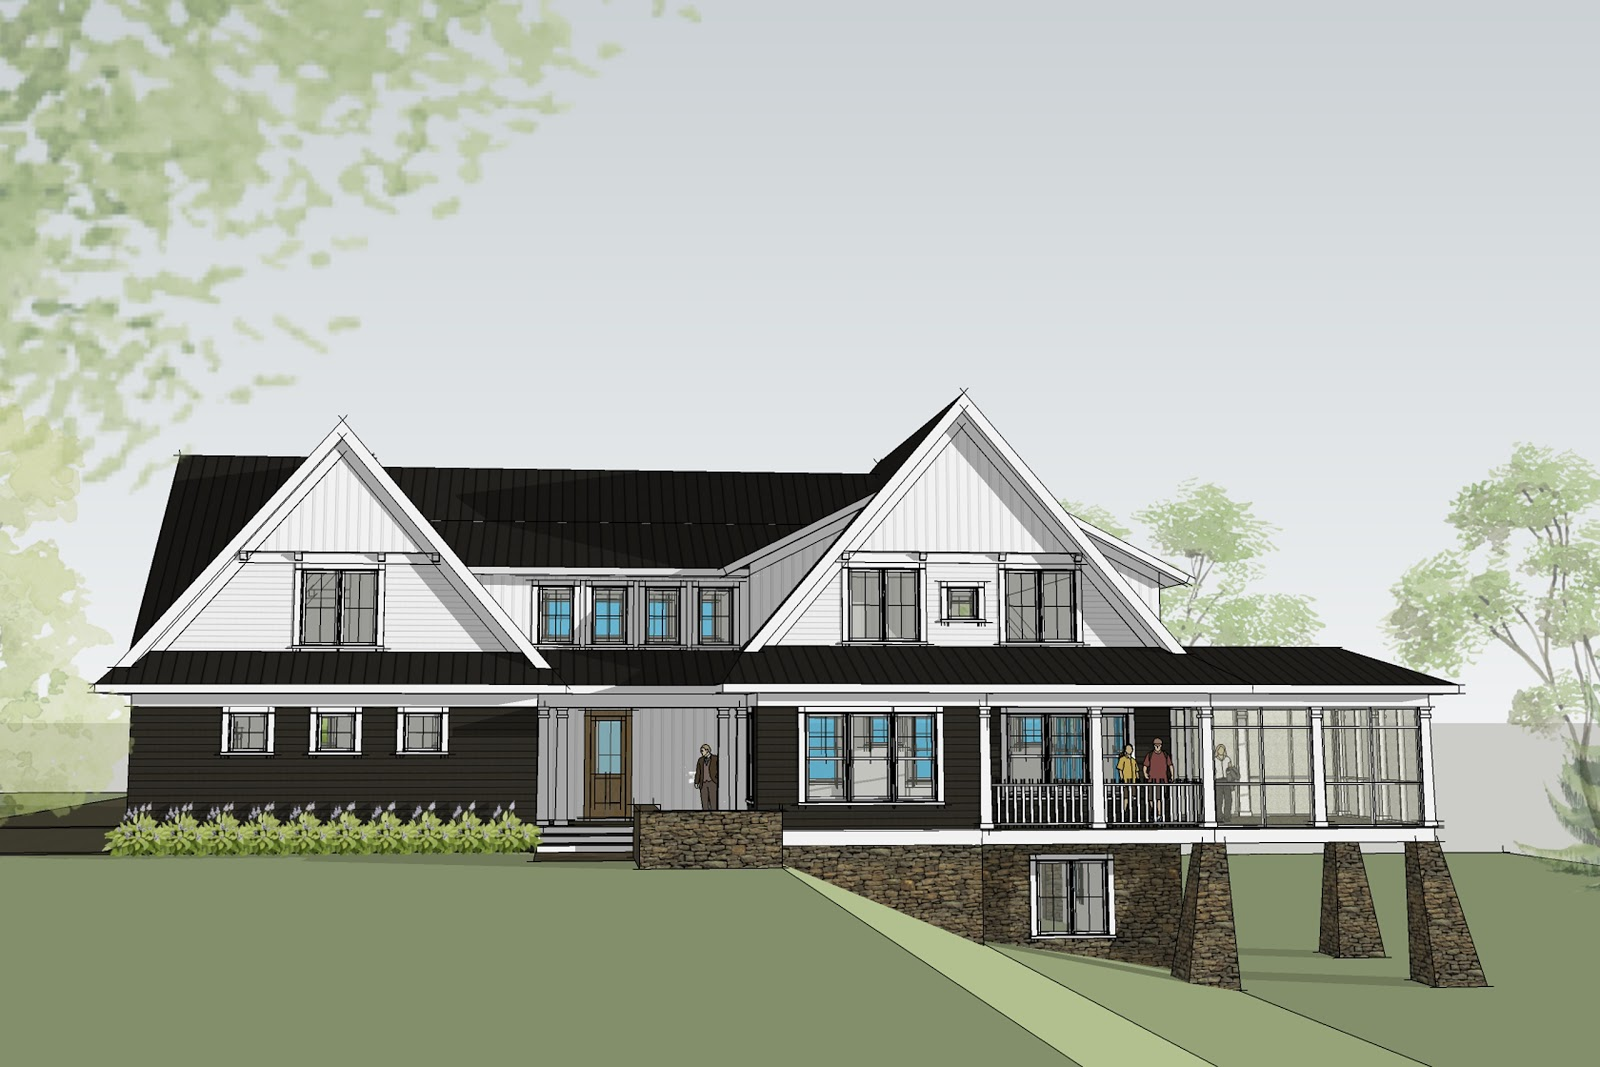 simply elegant home designs blog january 2012 ForSimply Elegant Home Designs